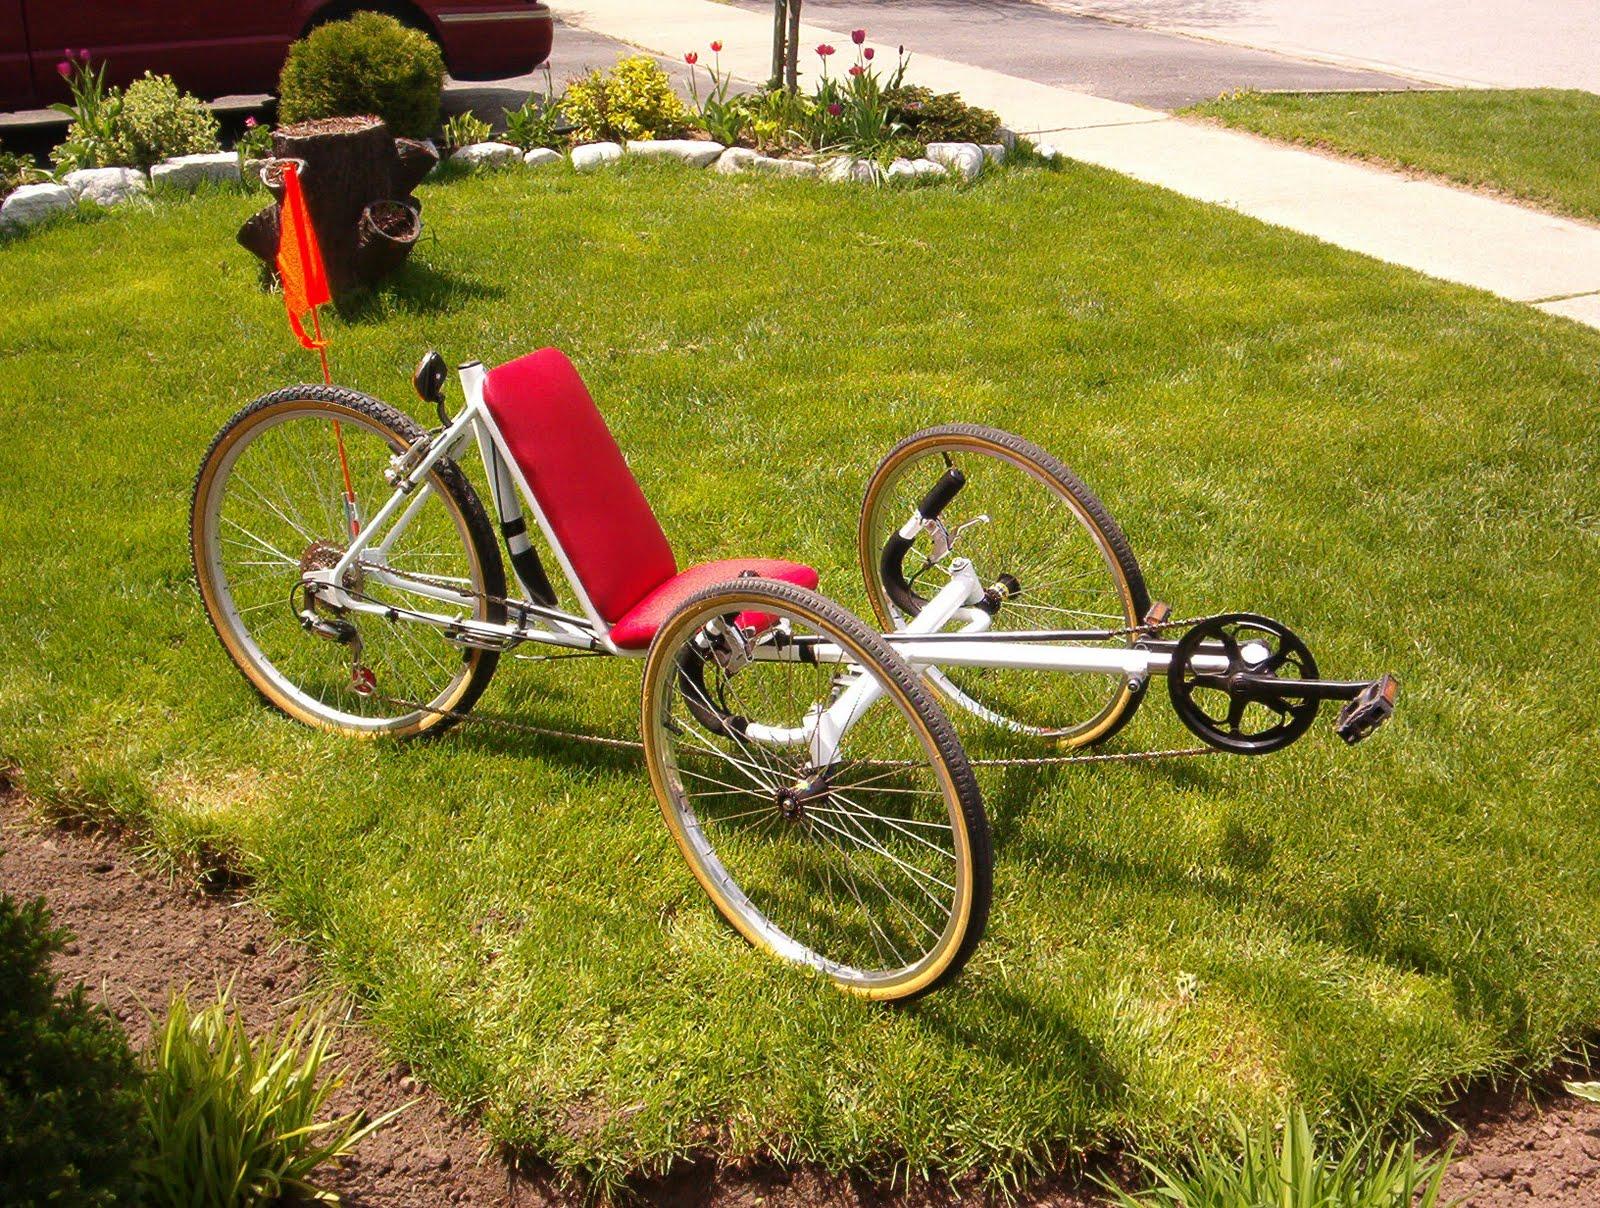 atomiczombie bikes trikes recumbents choppers ebikes. Black Bedroom Furniture Sets. Home Design Ideas